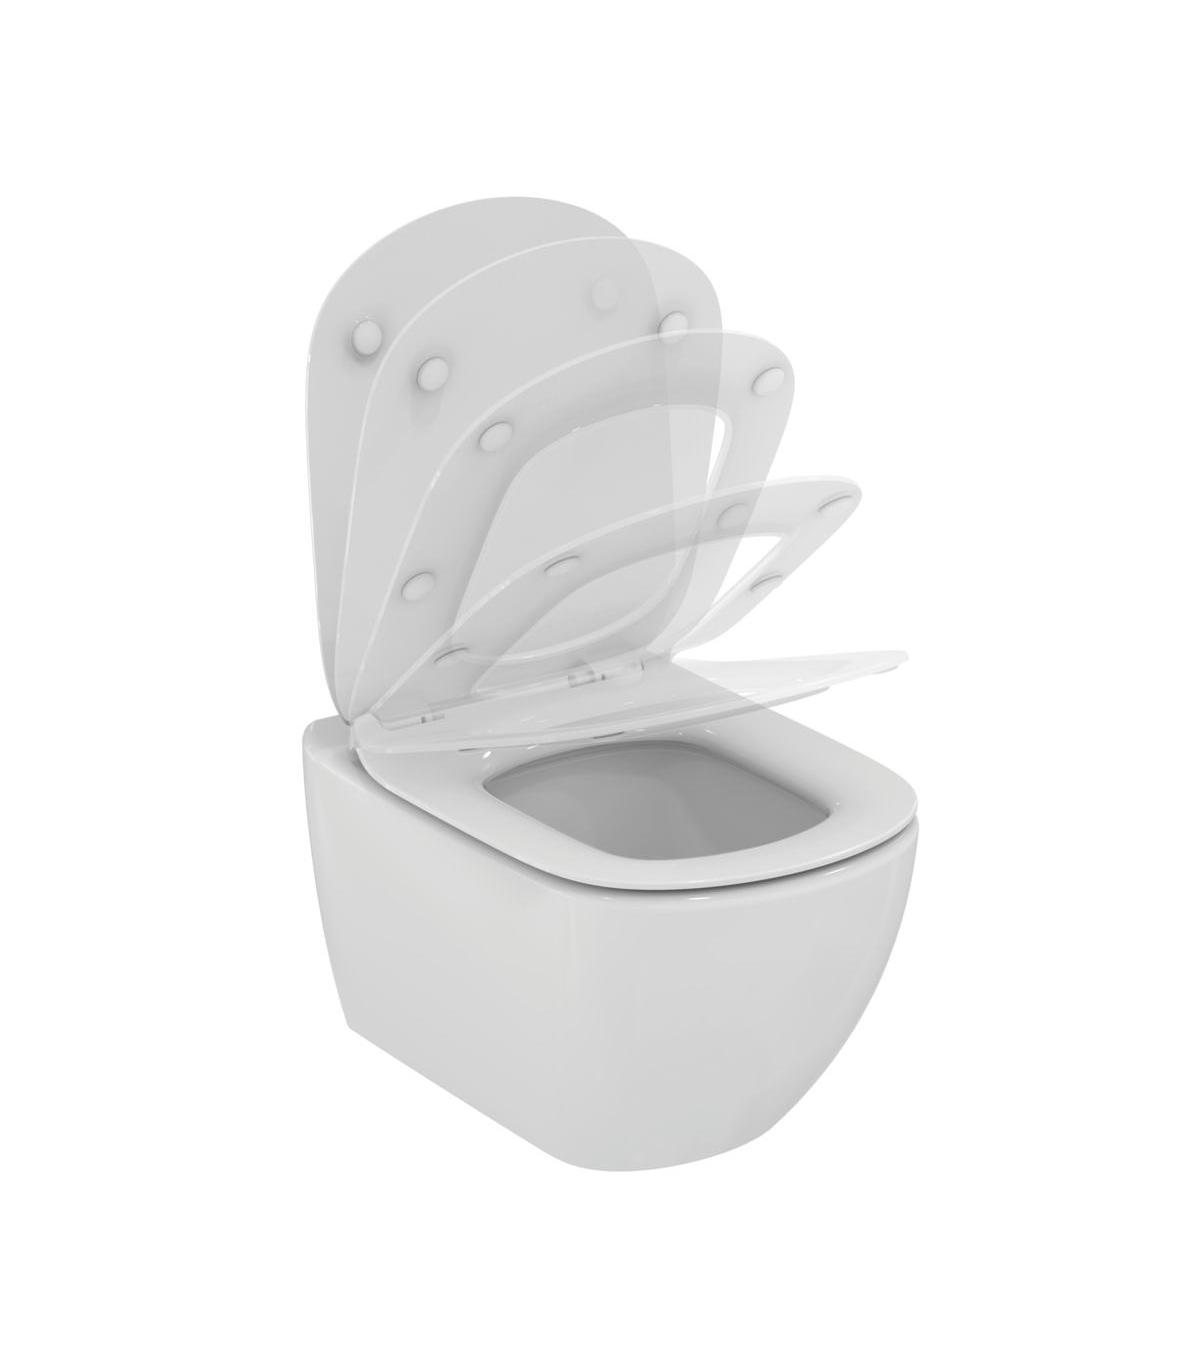 Sedile Wc Ideal Standard Serie Tesi.Vaso Wc Sospeso Ideal Standard Tesi Aquablade Con Sedile Slim